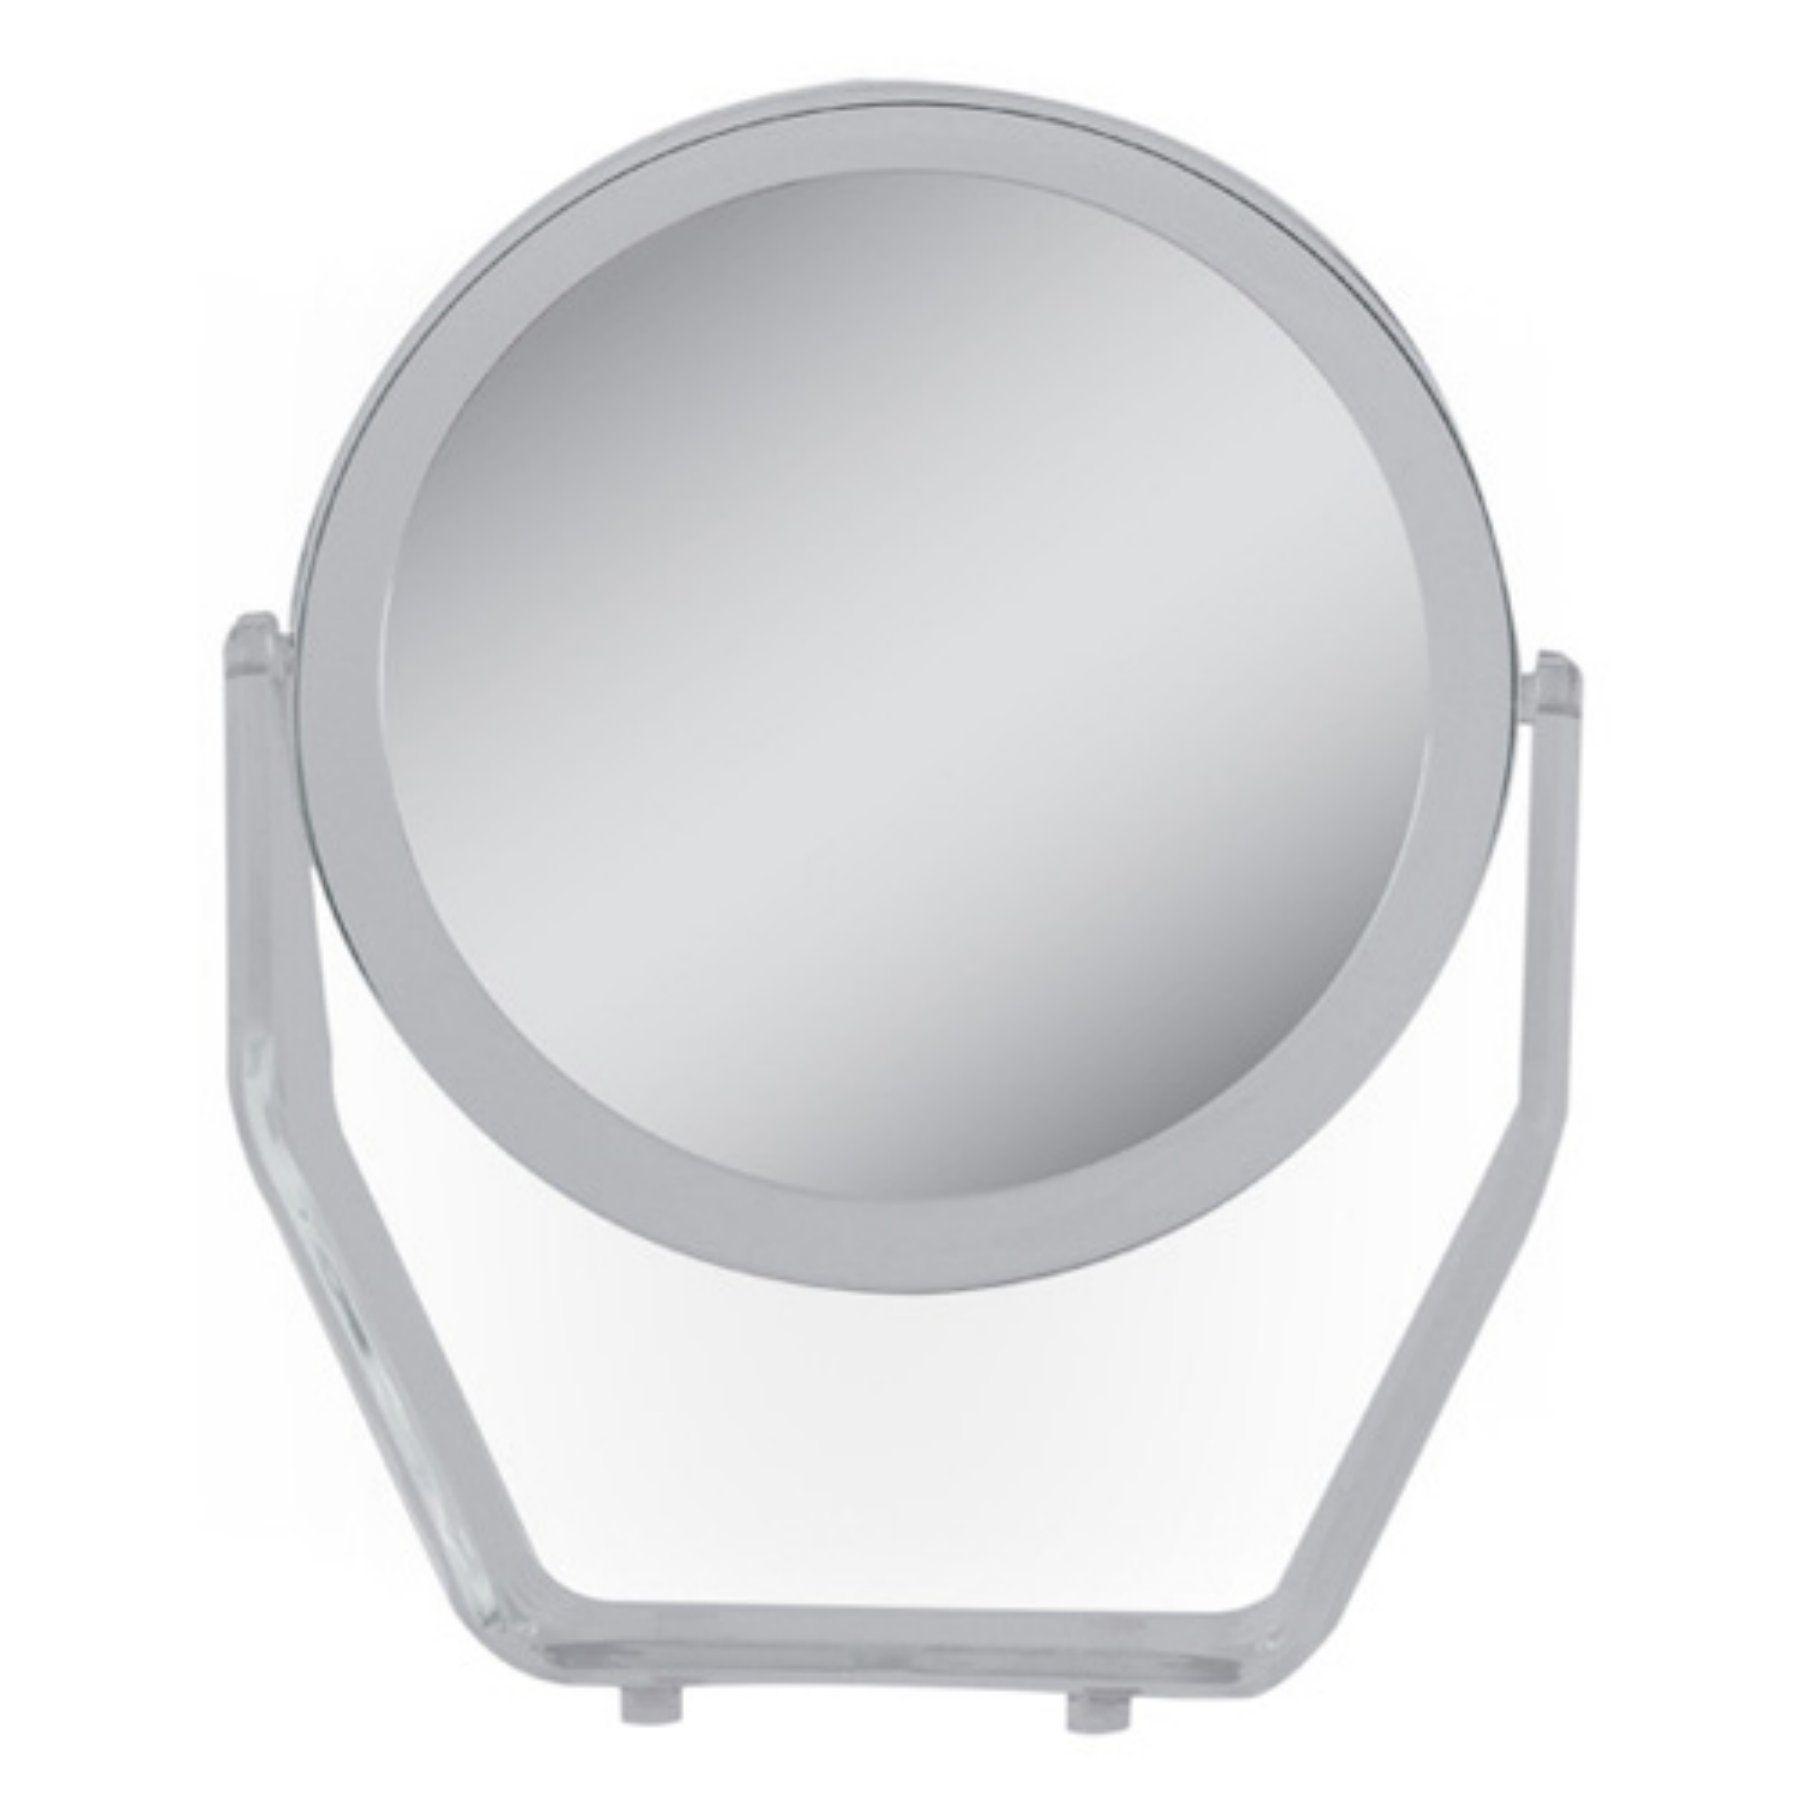 Zadro 8 5 In 5x 1x Swivel Acrylic Vanity Mirror Zv08